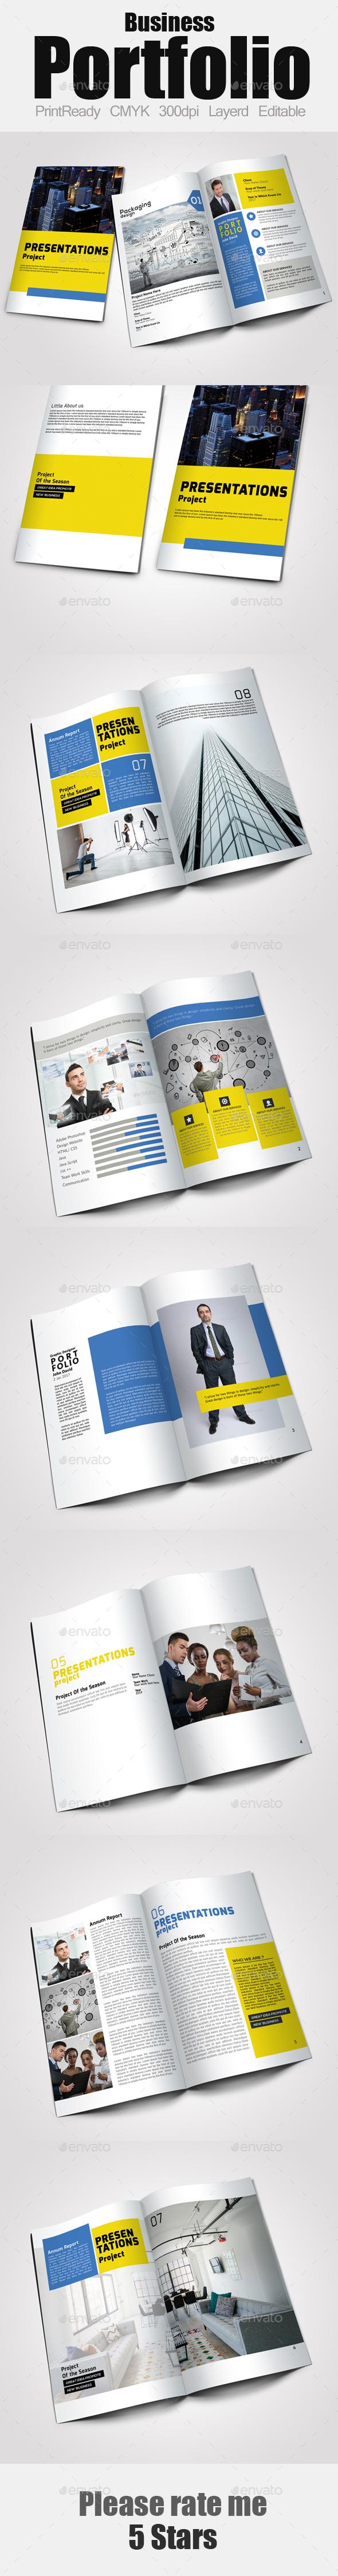 Business Portfolio Template - Portfolio Brochures